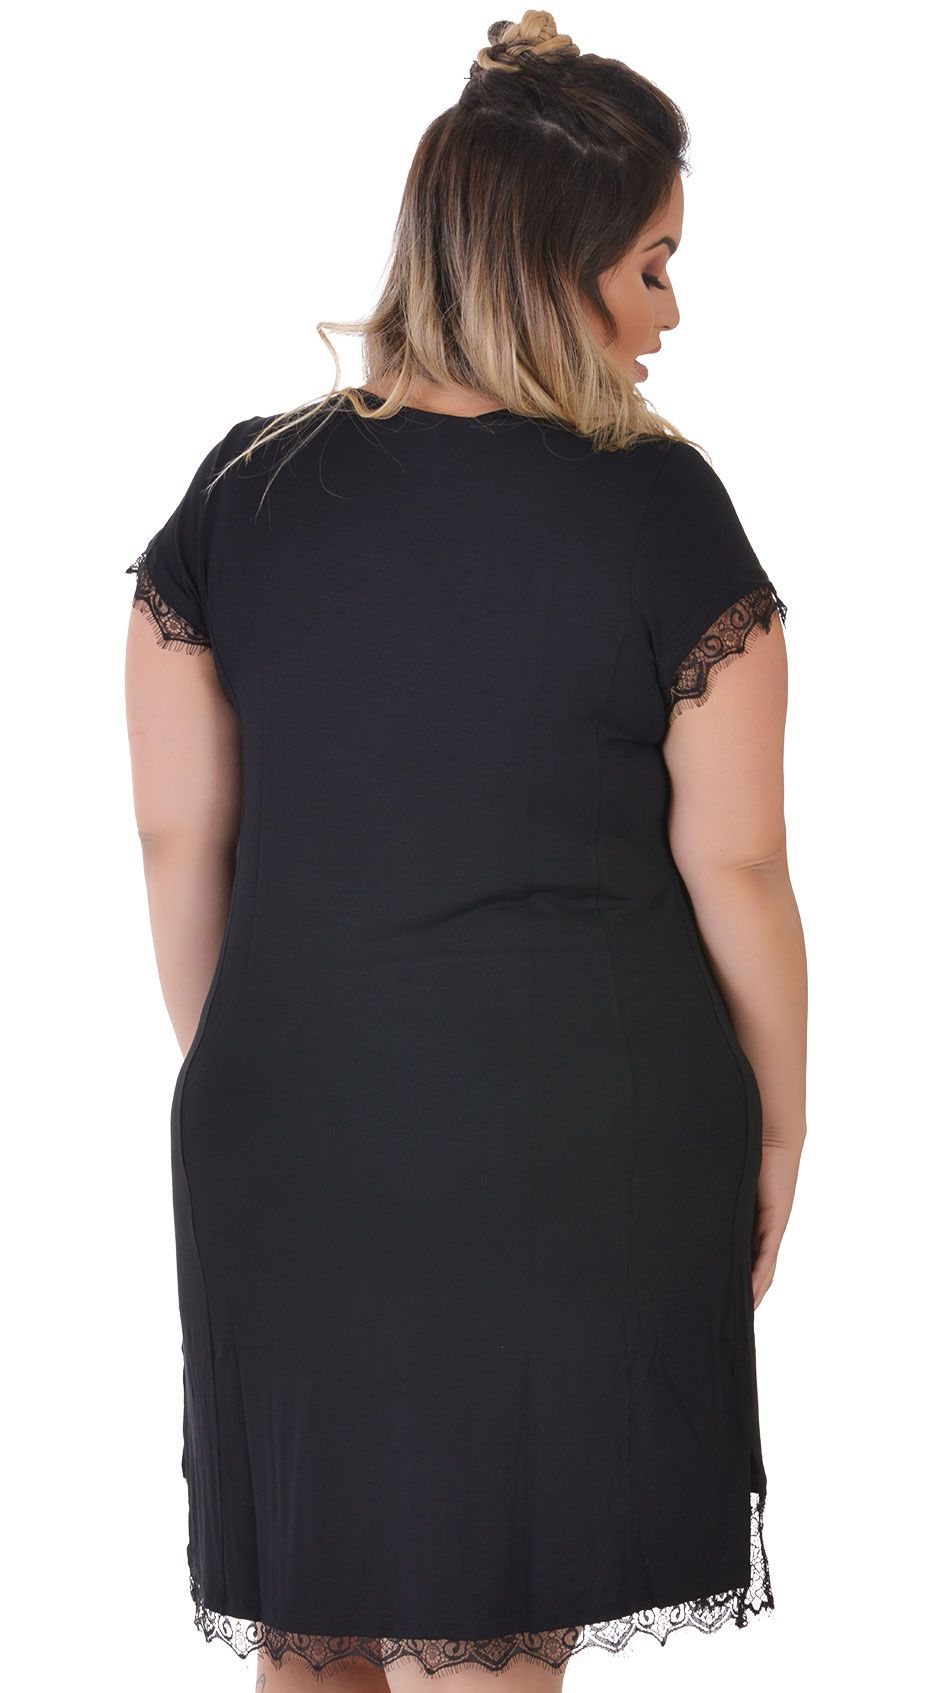 Vestido Plus Size Reddito